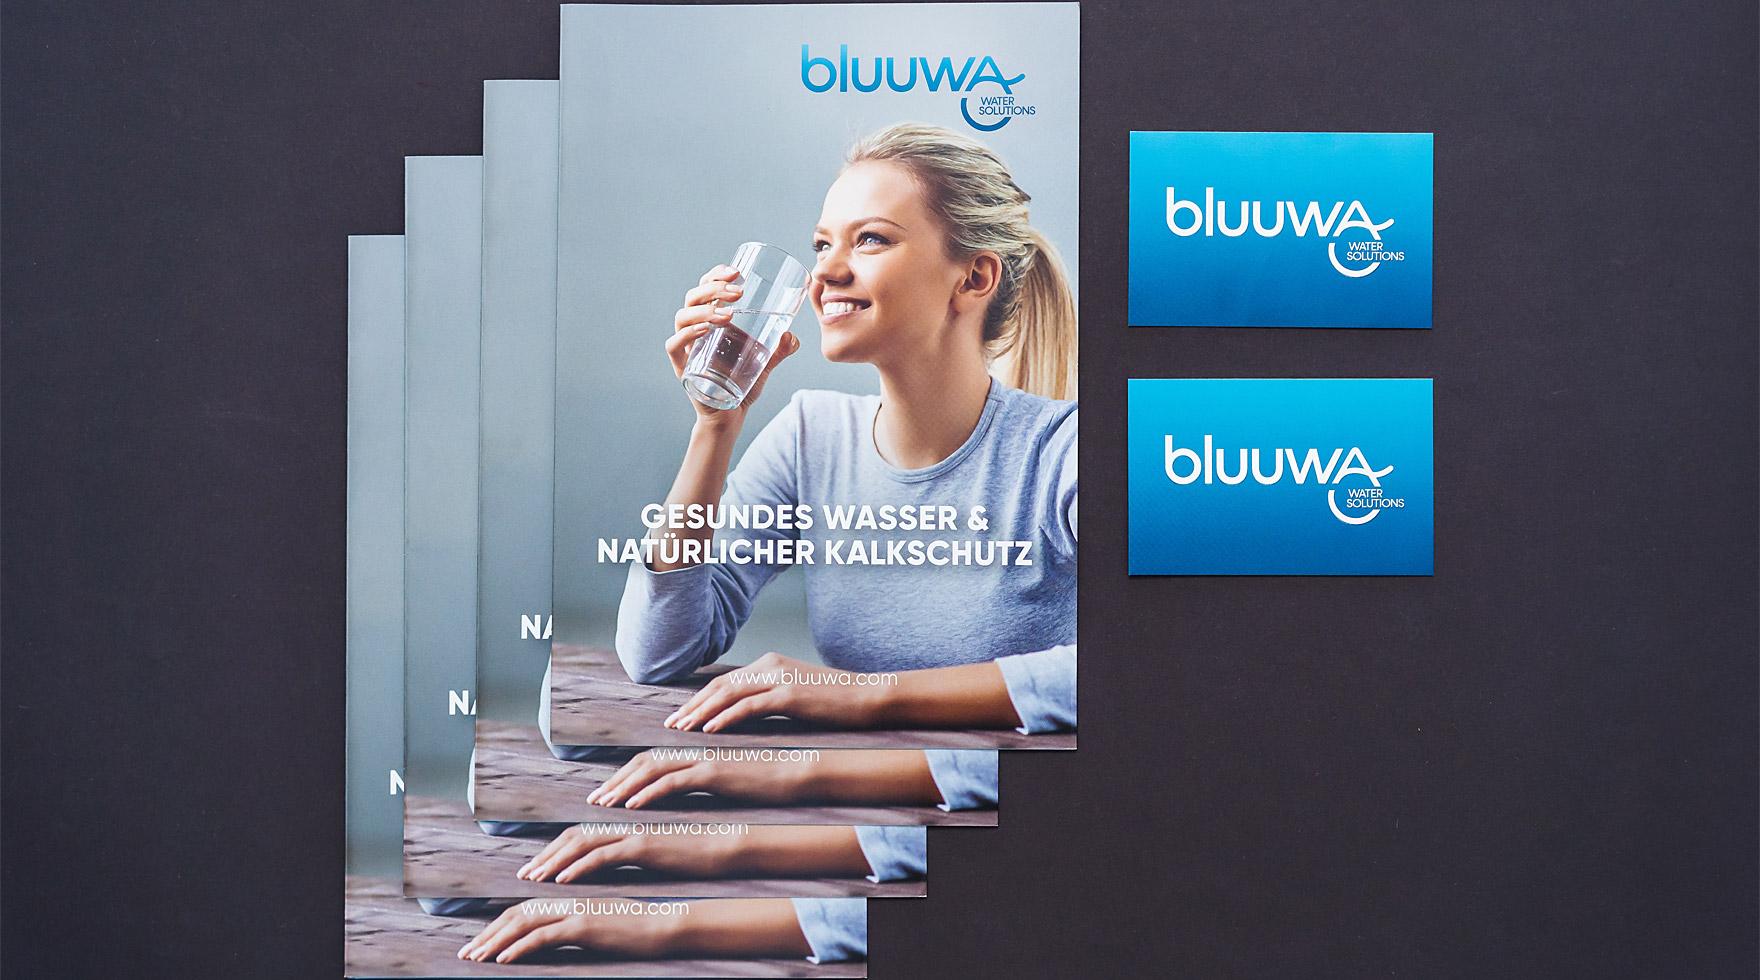 folder-design-bluuwa-webkreation-berlin